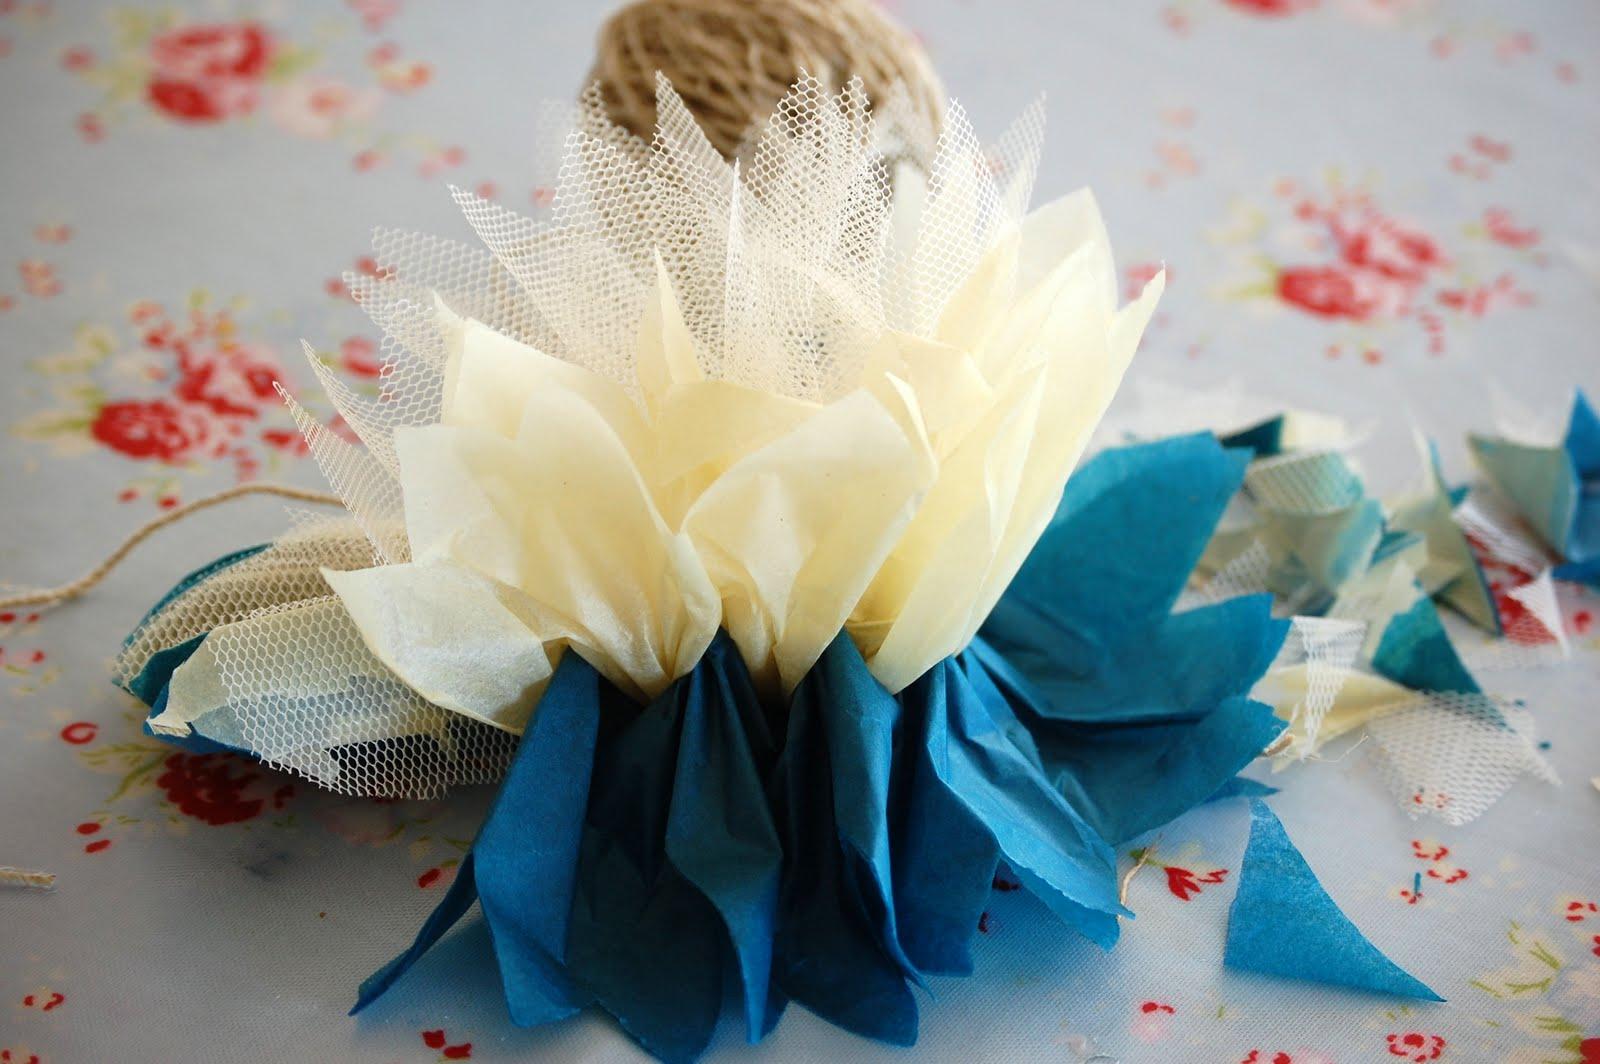 como fazer pompom papel de seda tule decoracao festa aniversario batizado casamento cha de bebe (5)